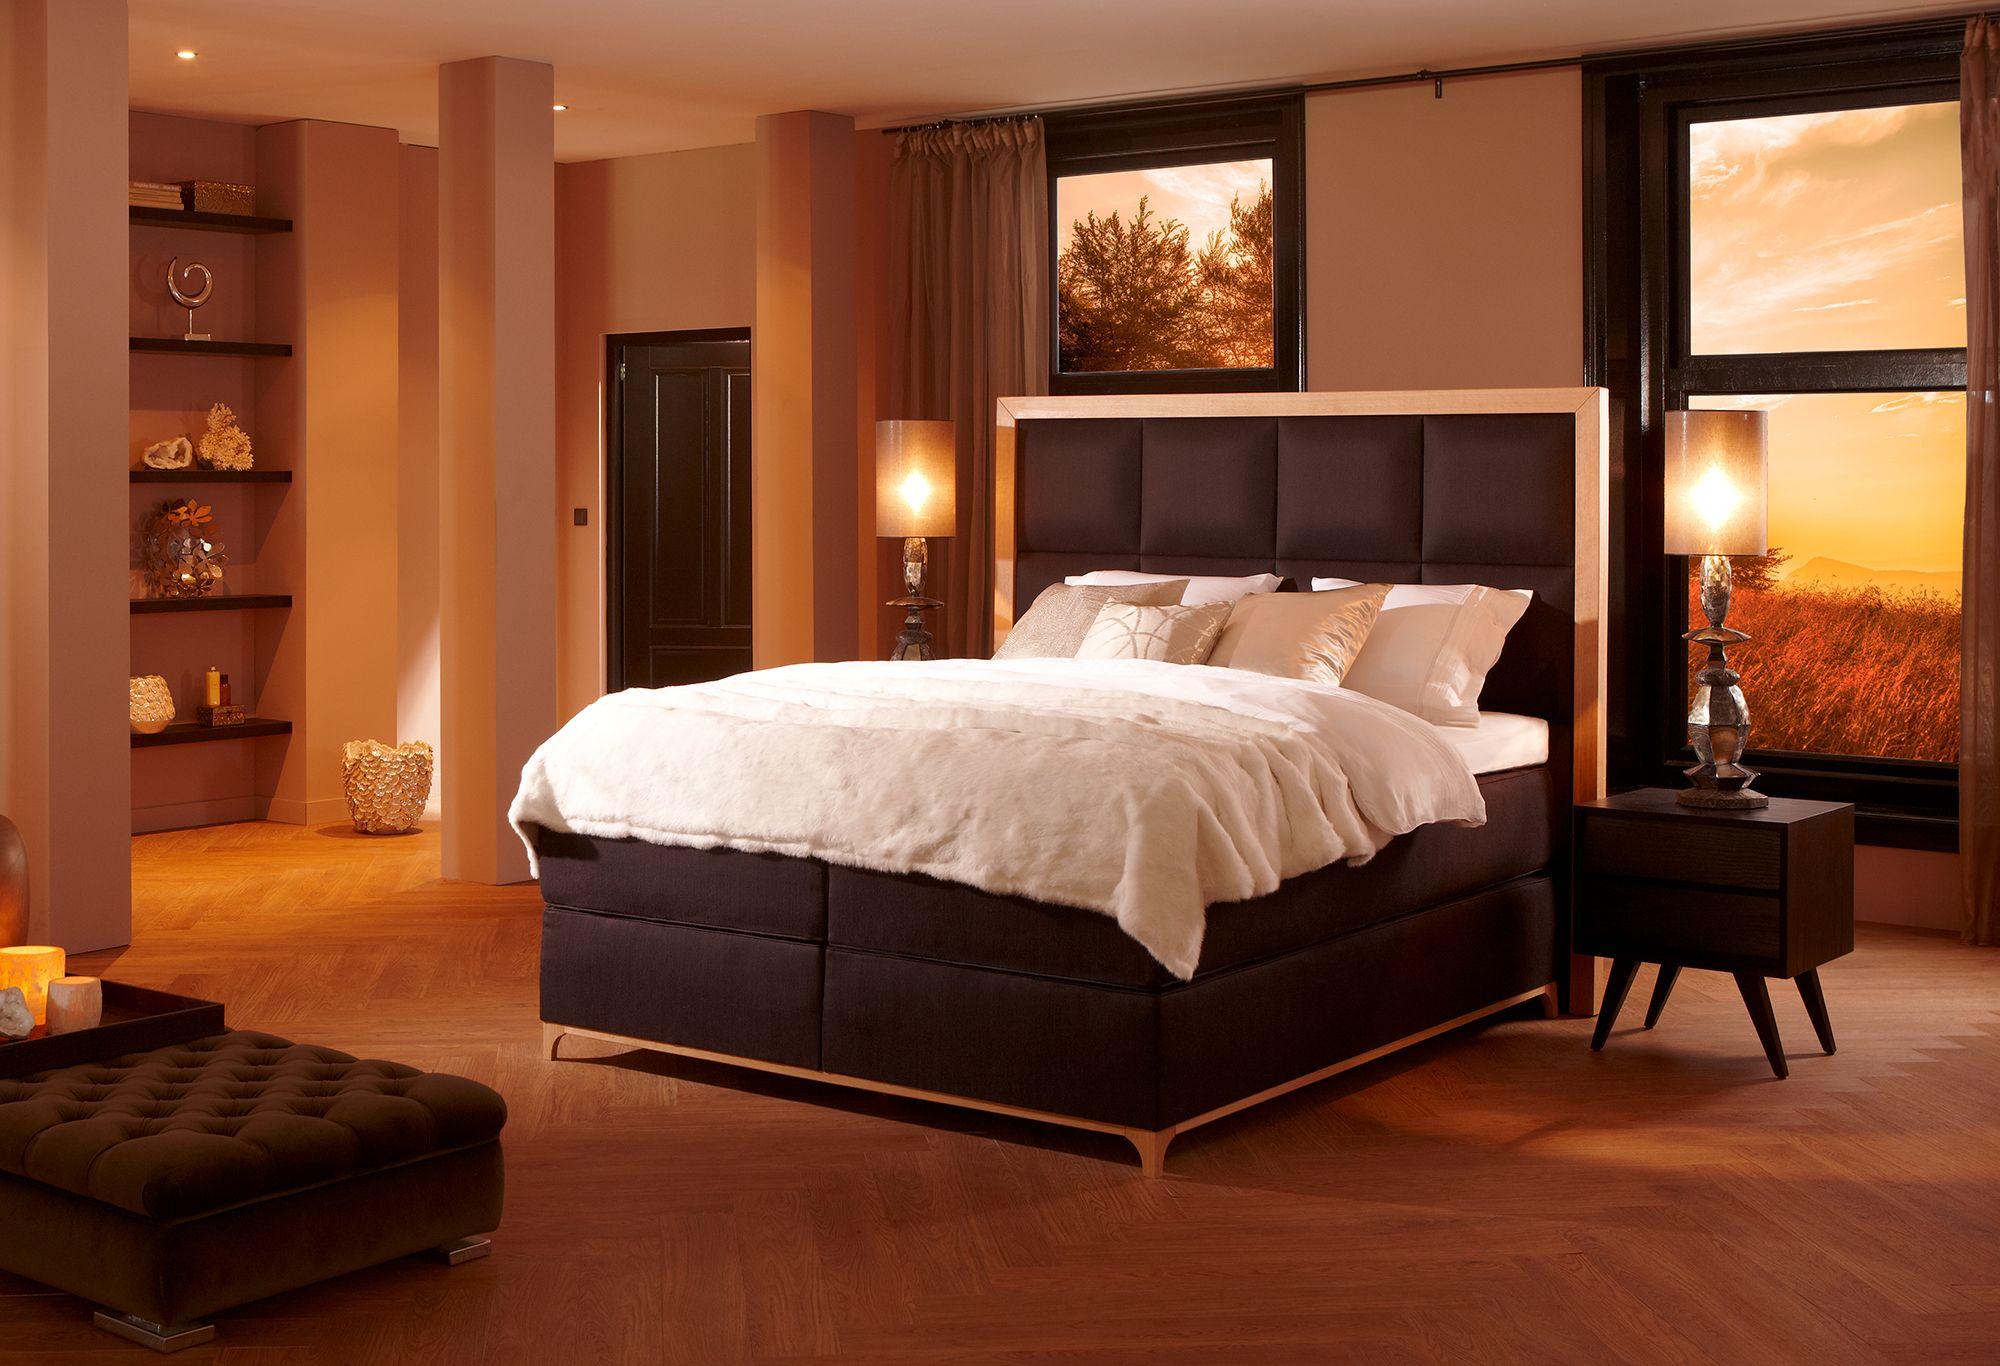 Boxspring diks ivoire boxsprings swiss sense home decor bed